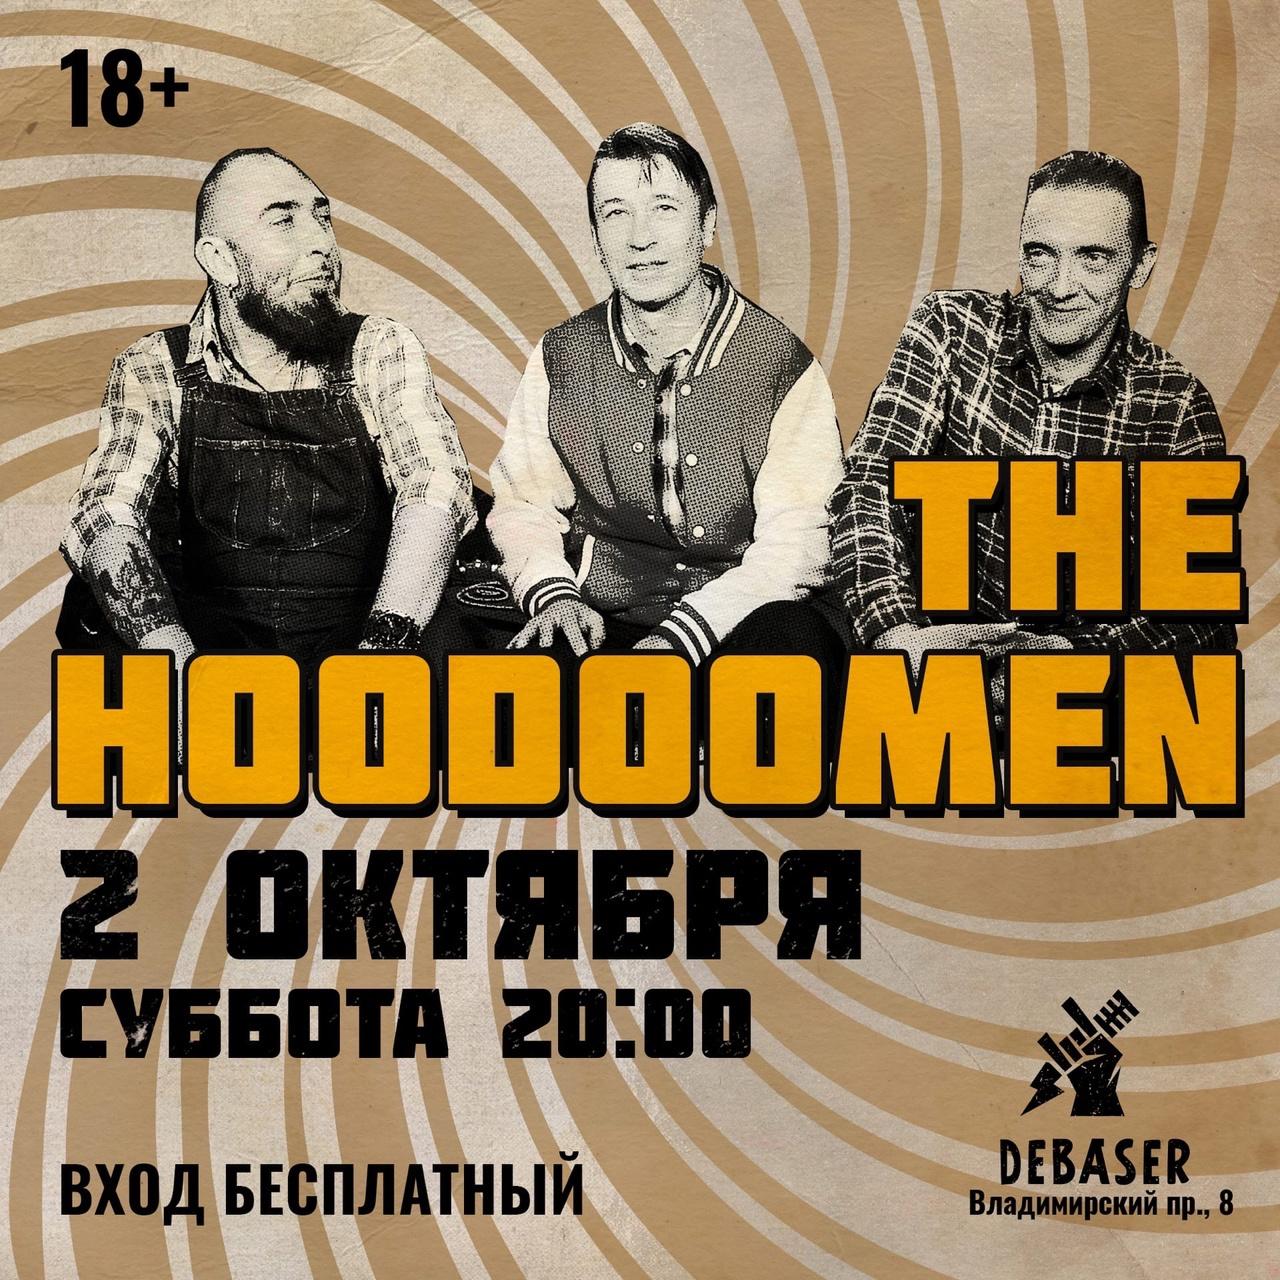 02.10 The HoodooMen в баре Debaser!